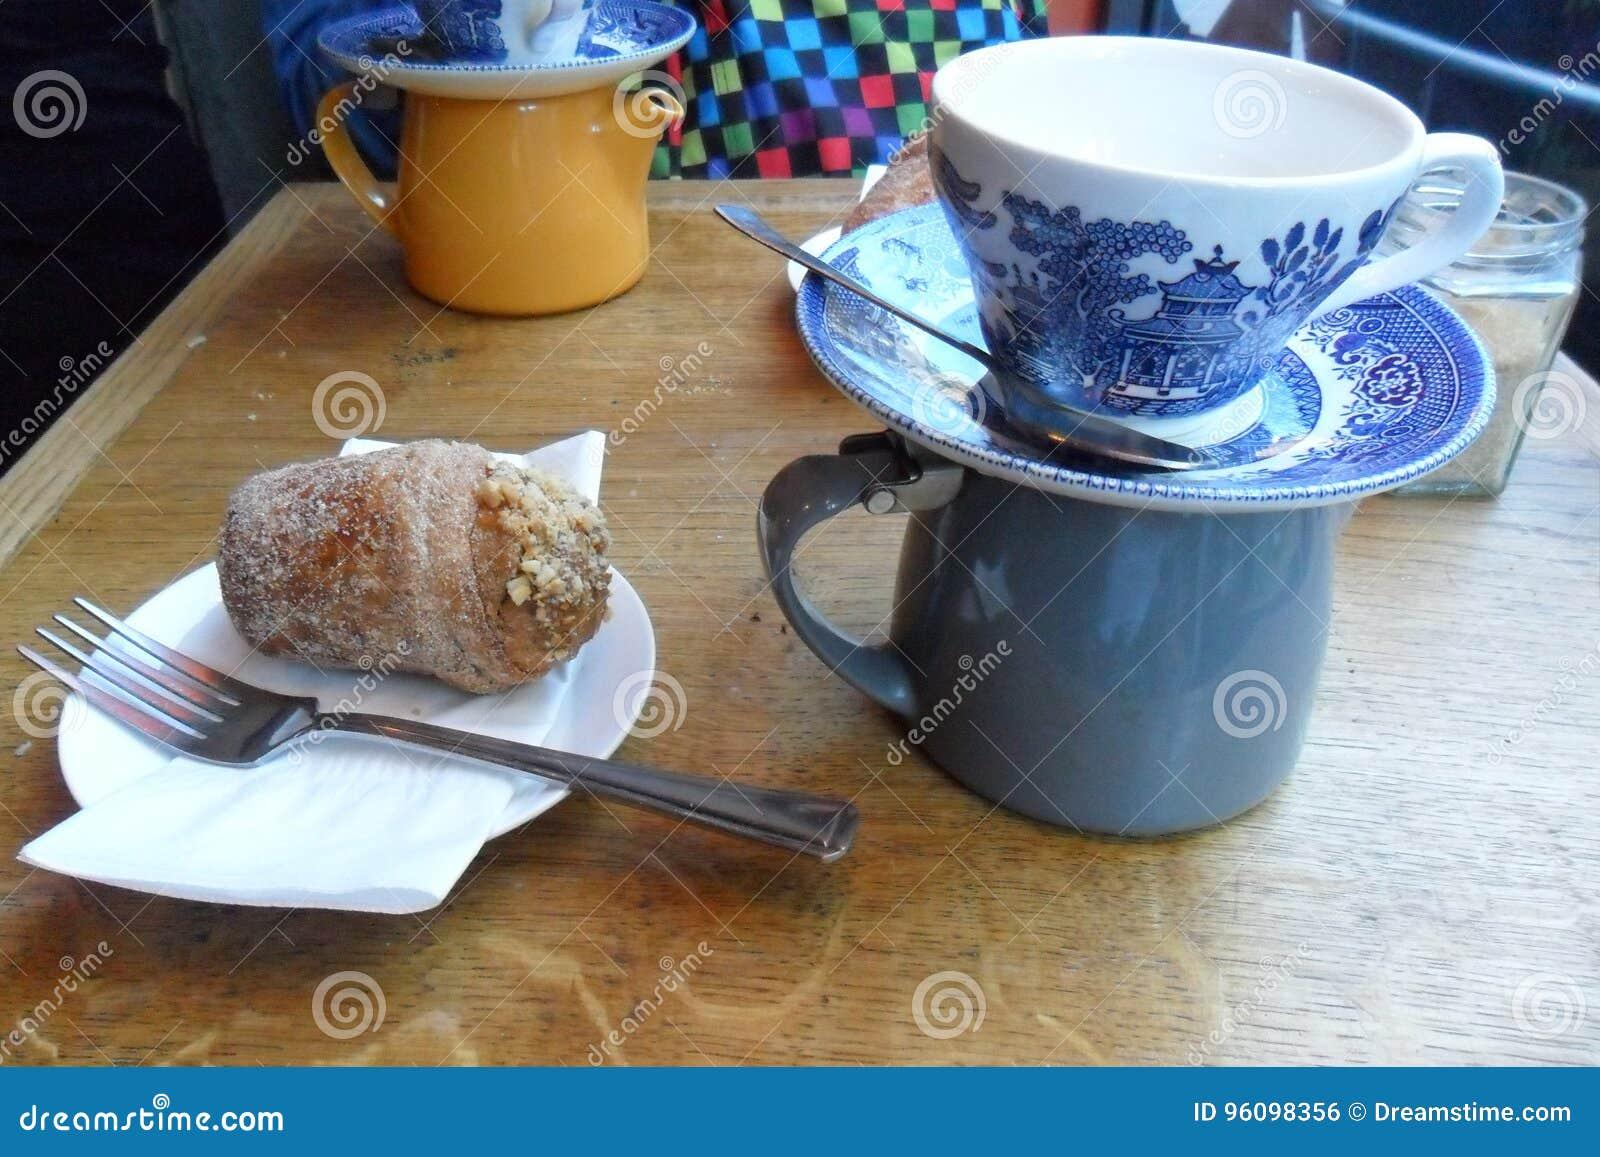 Tea and cruffin in London